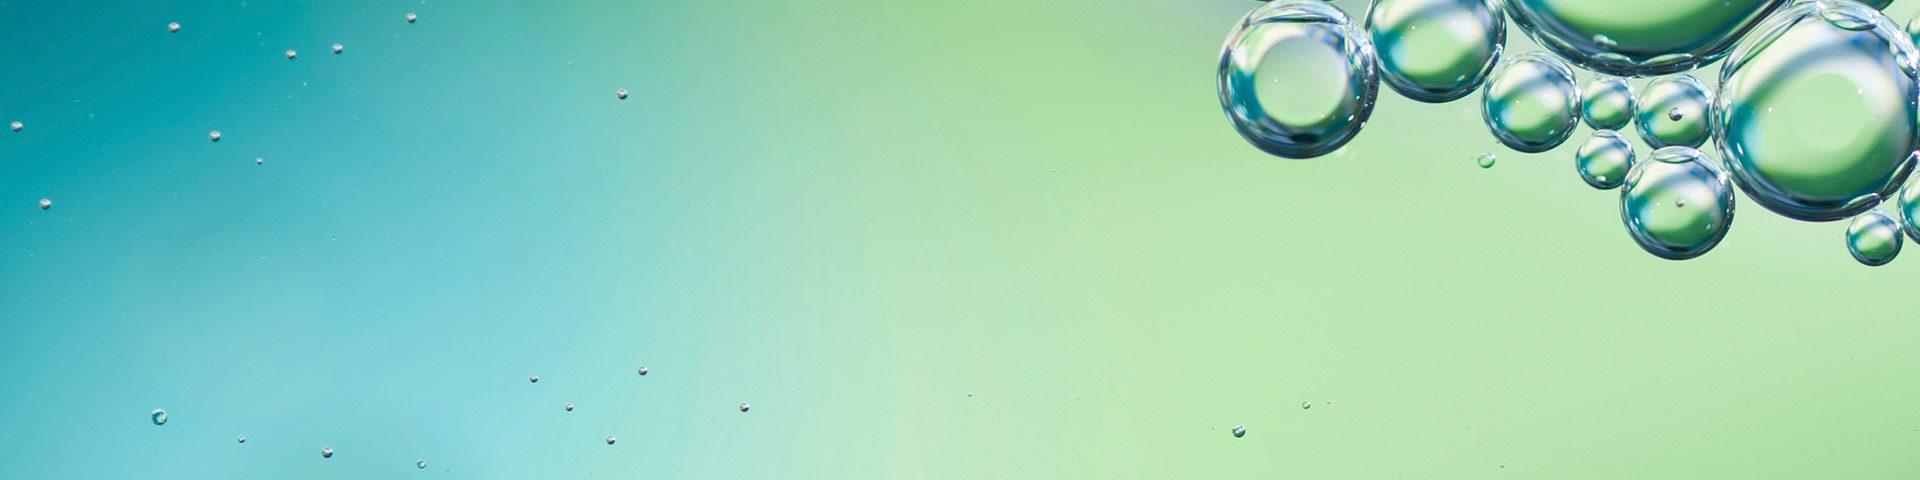 qPCRBIO SyGreen Mix Image Banner